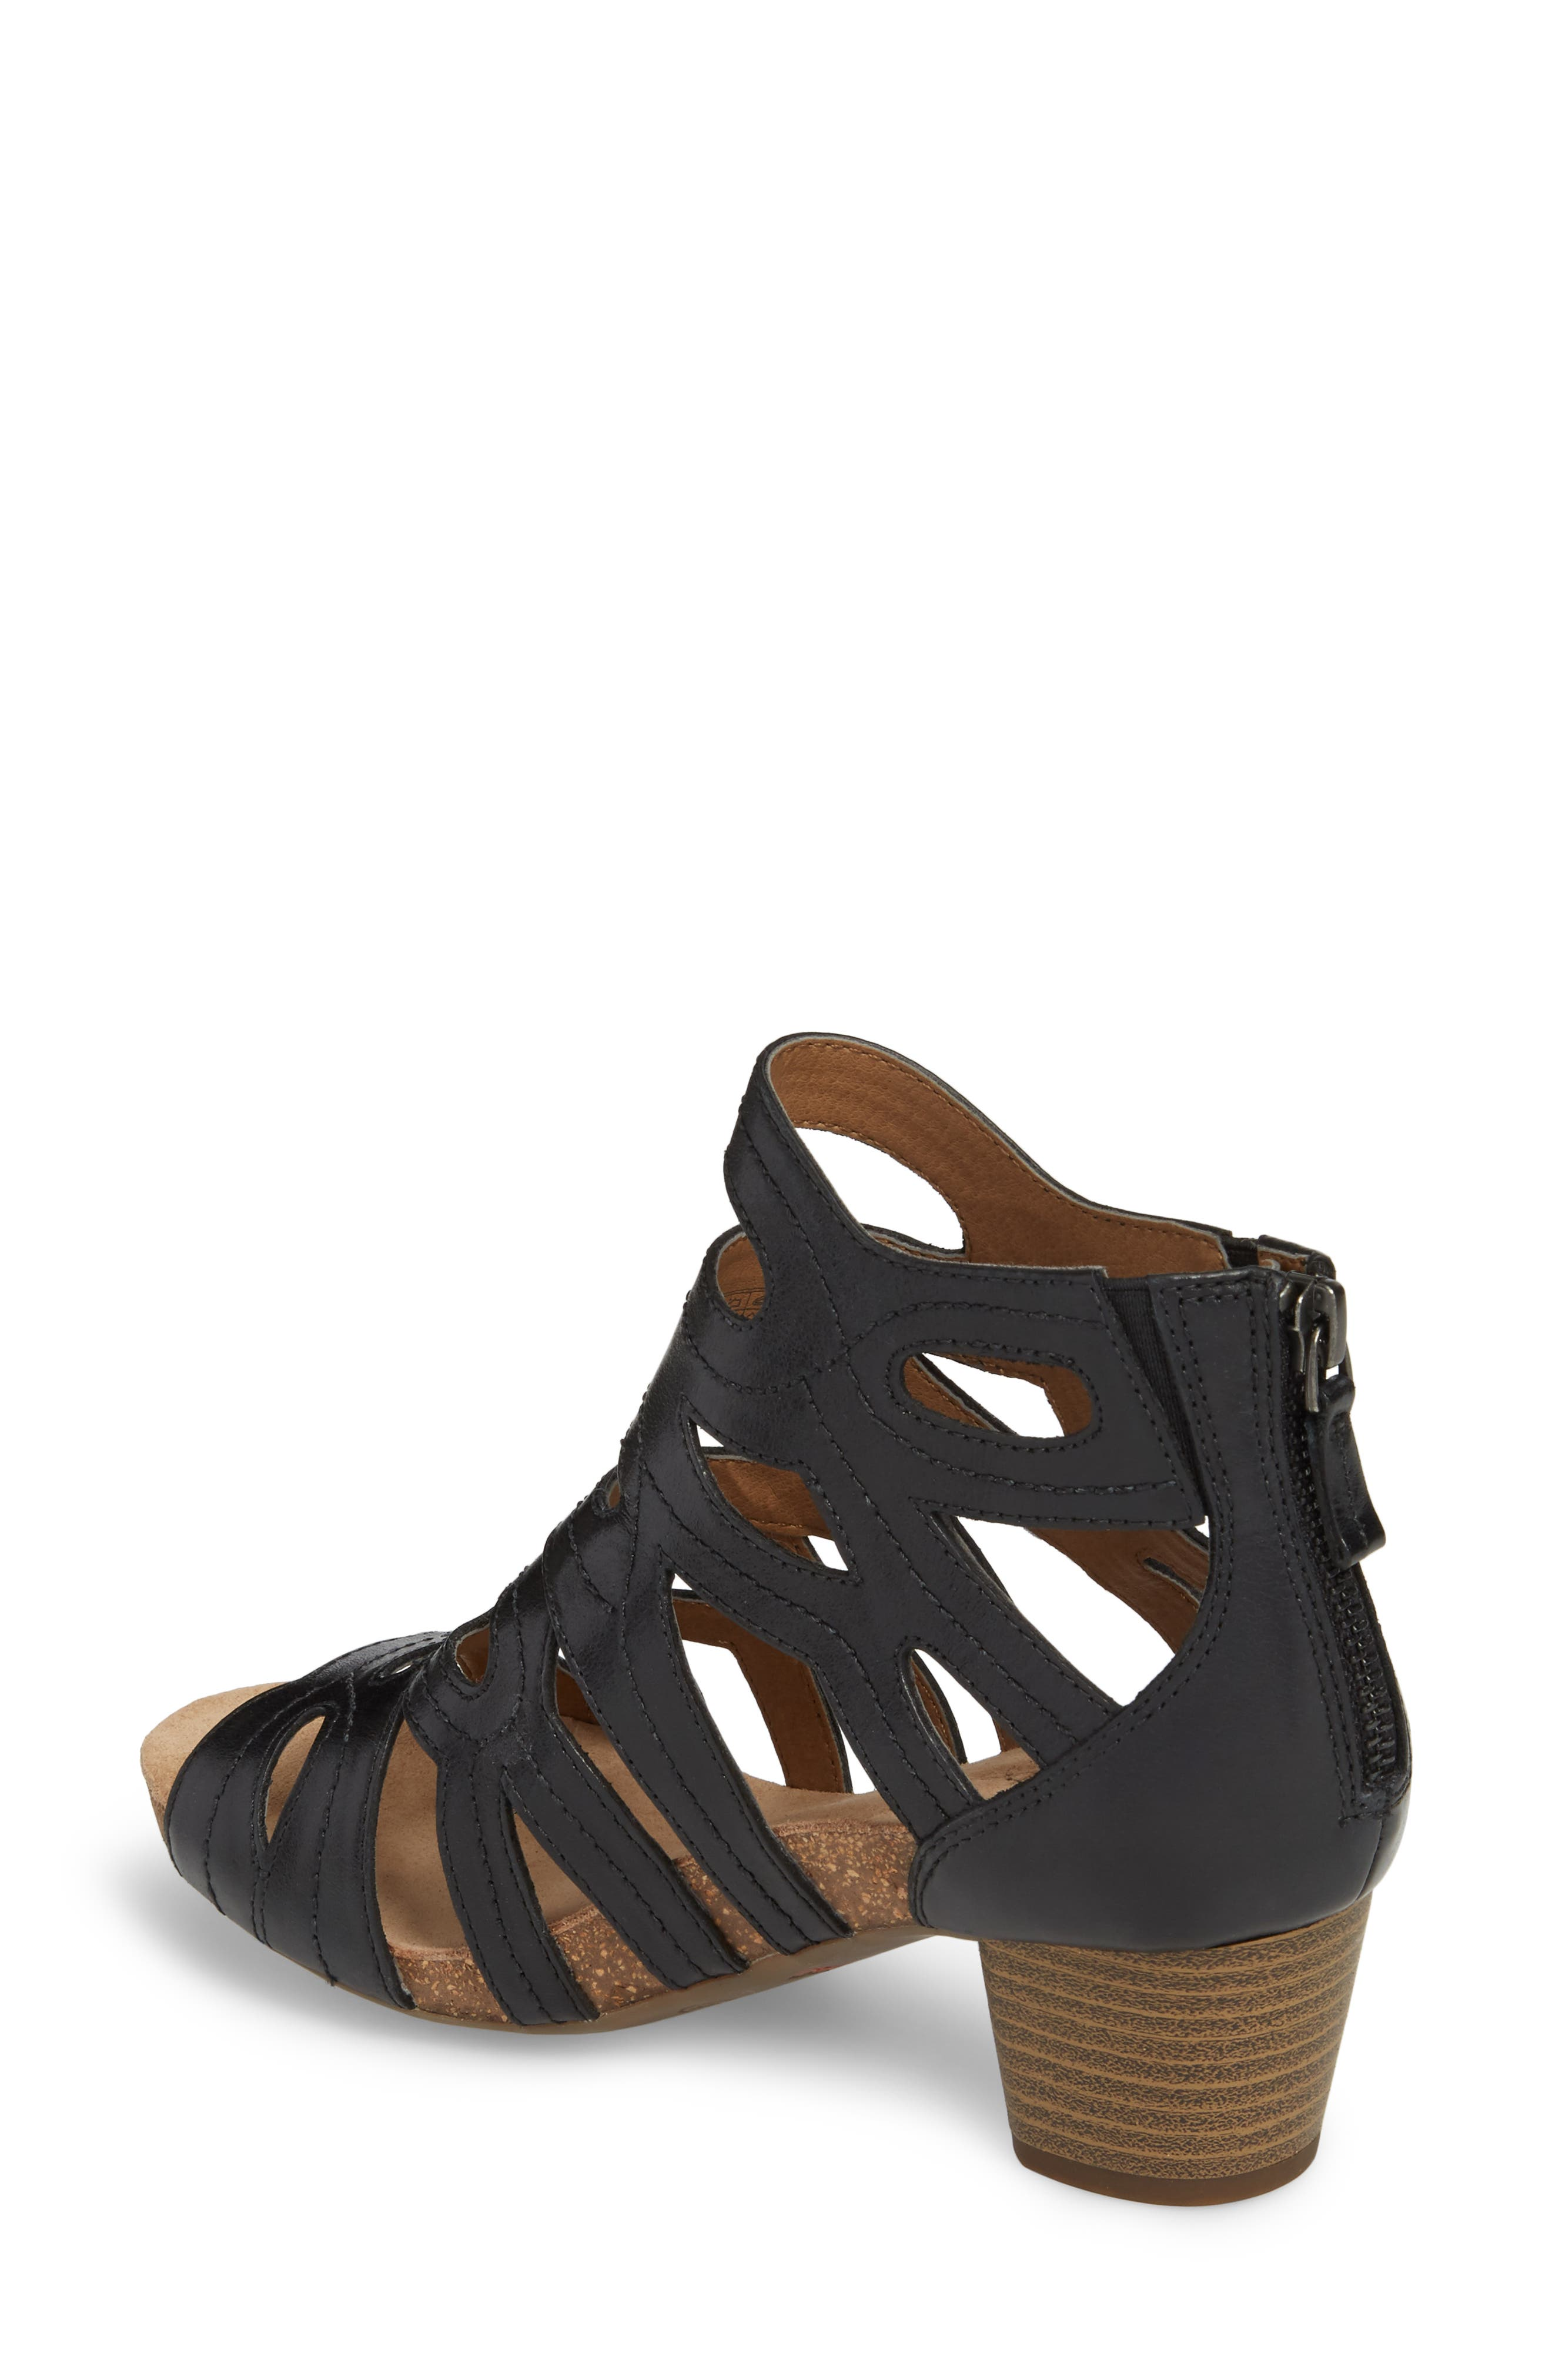 Rose 21 Gladiator Sandal,                             Alternate thumbnail 2, color,                             BLACK LEATHER